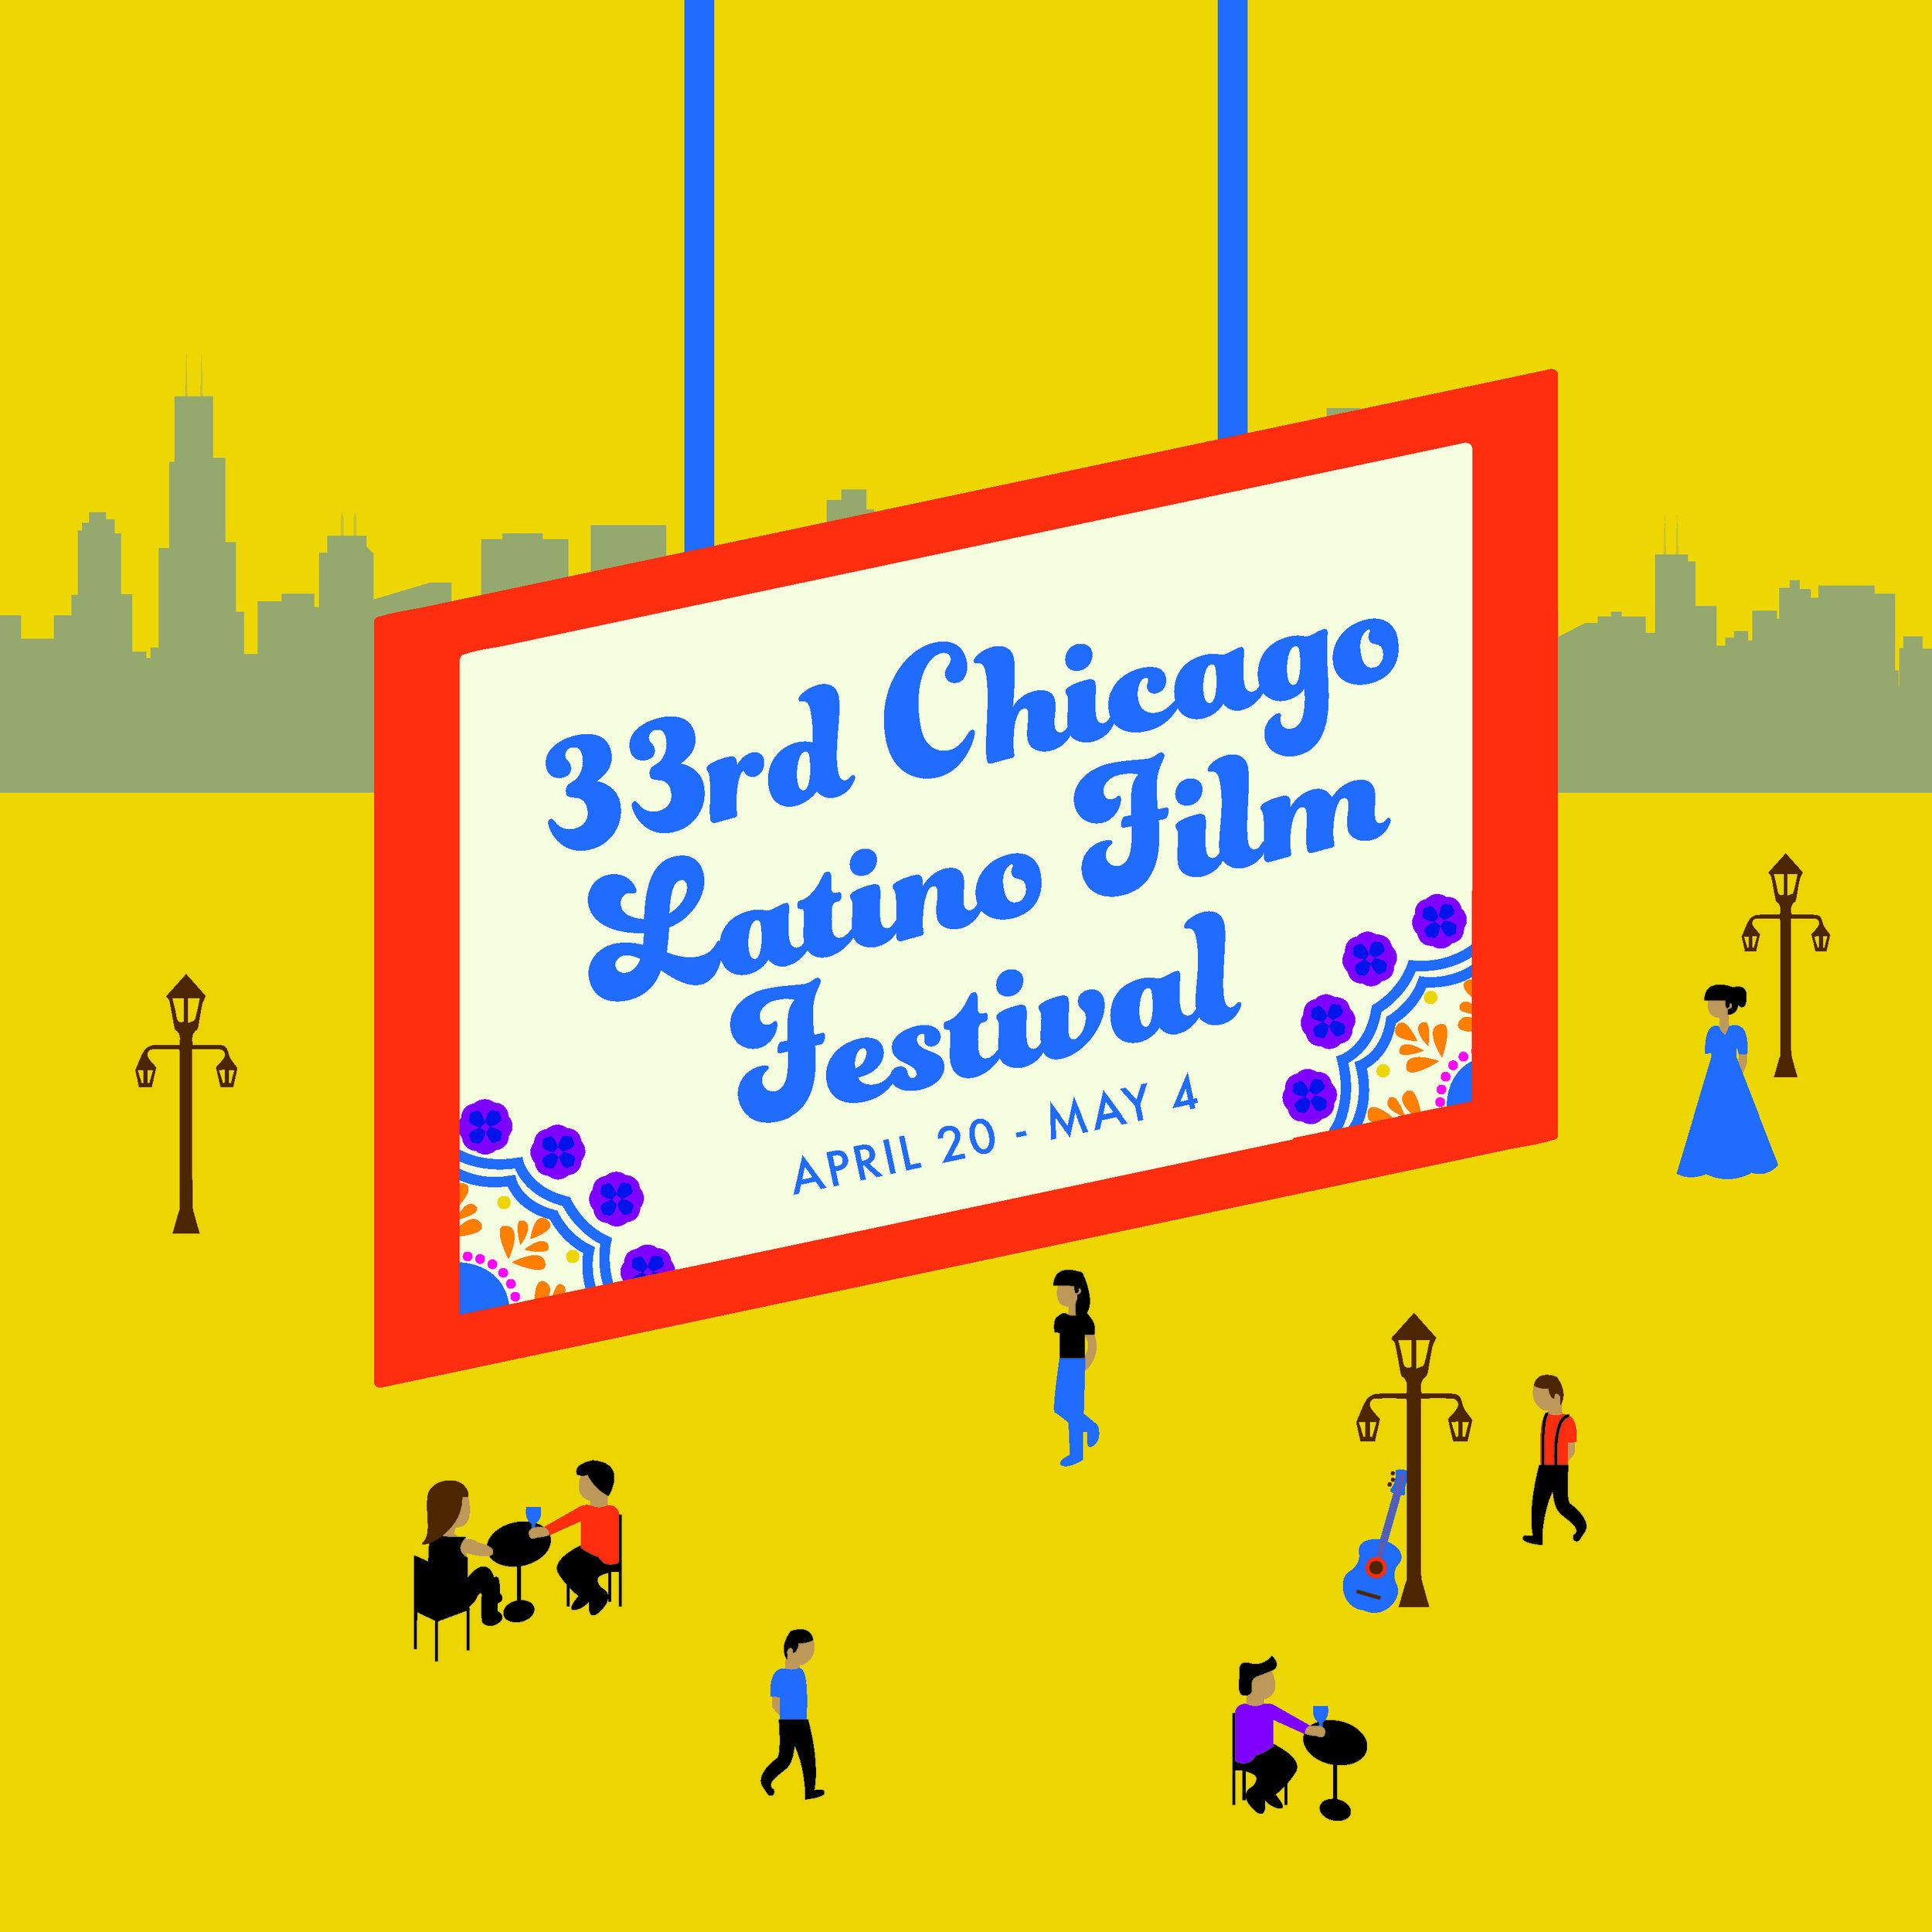 33rd Chicago Latino Film Festival Poster